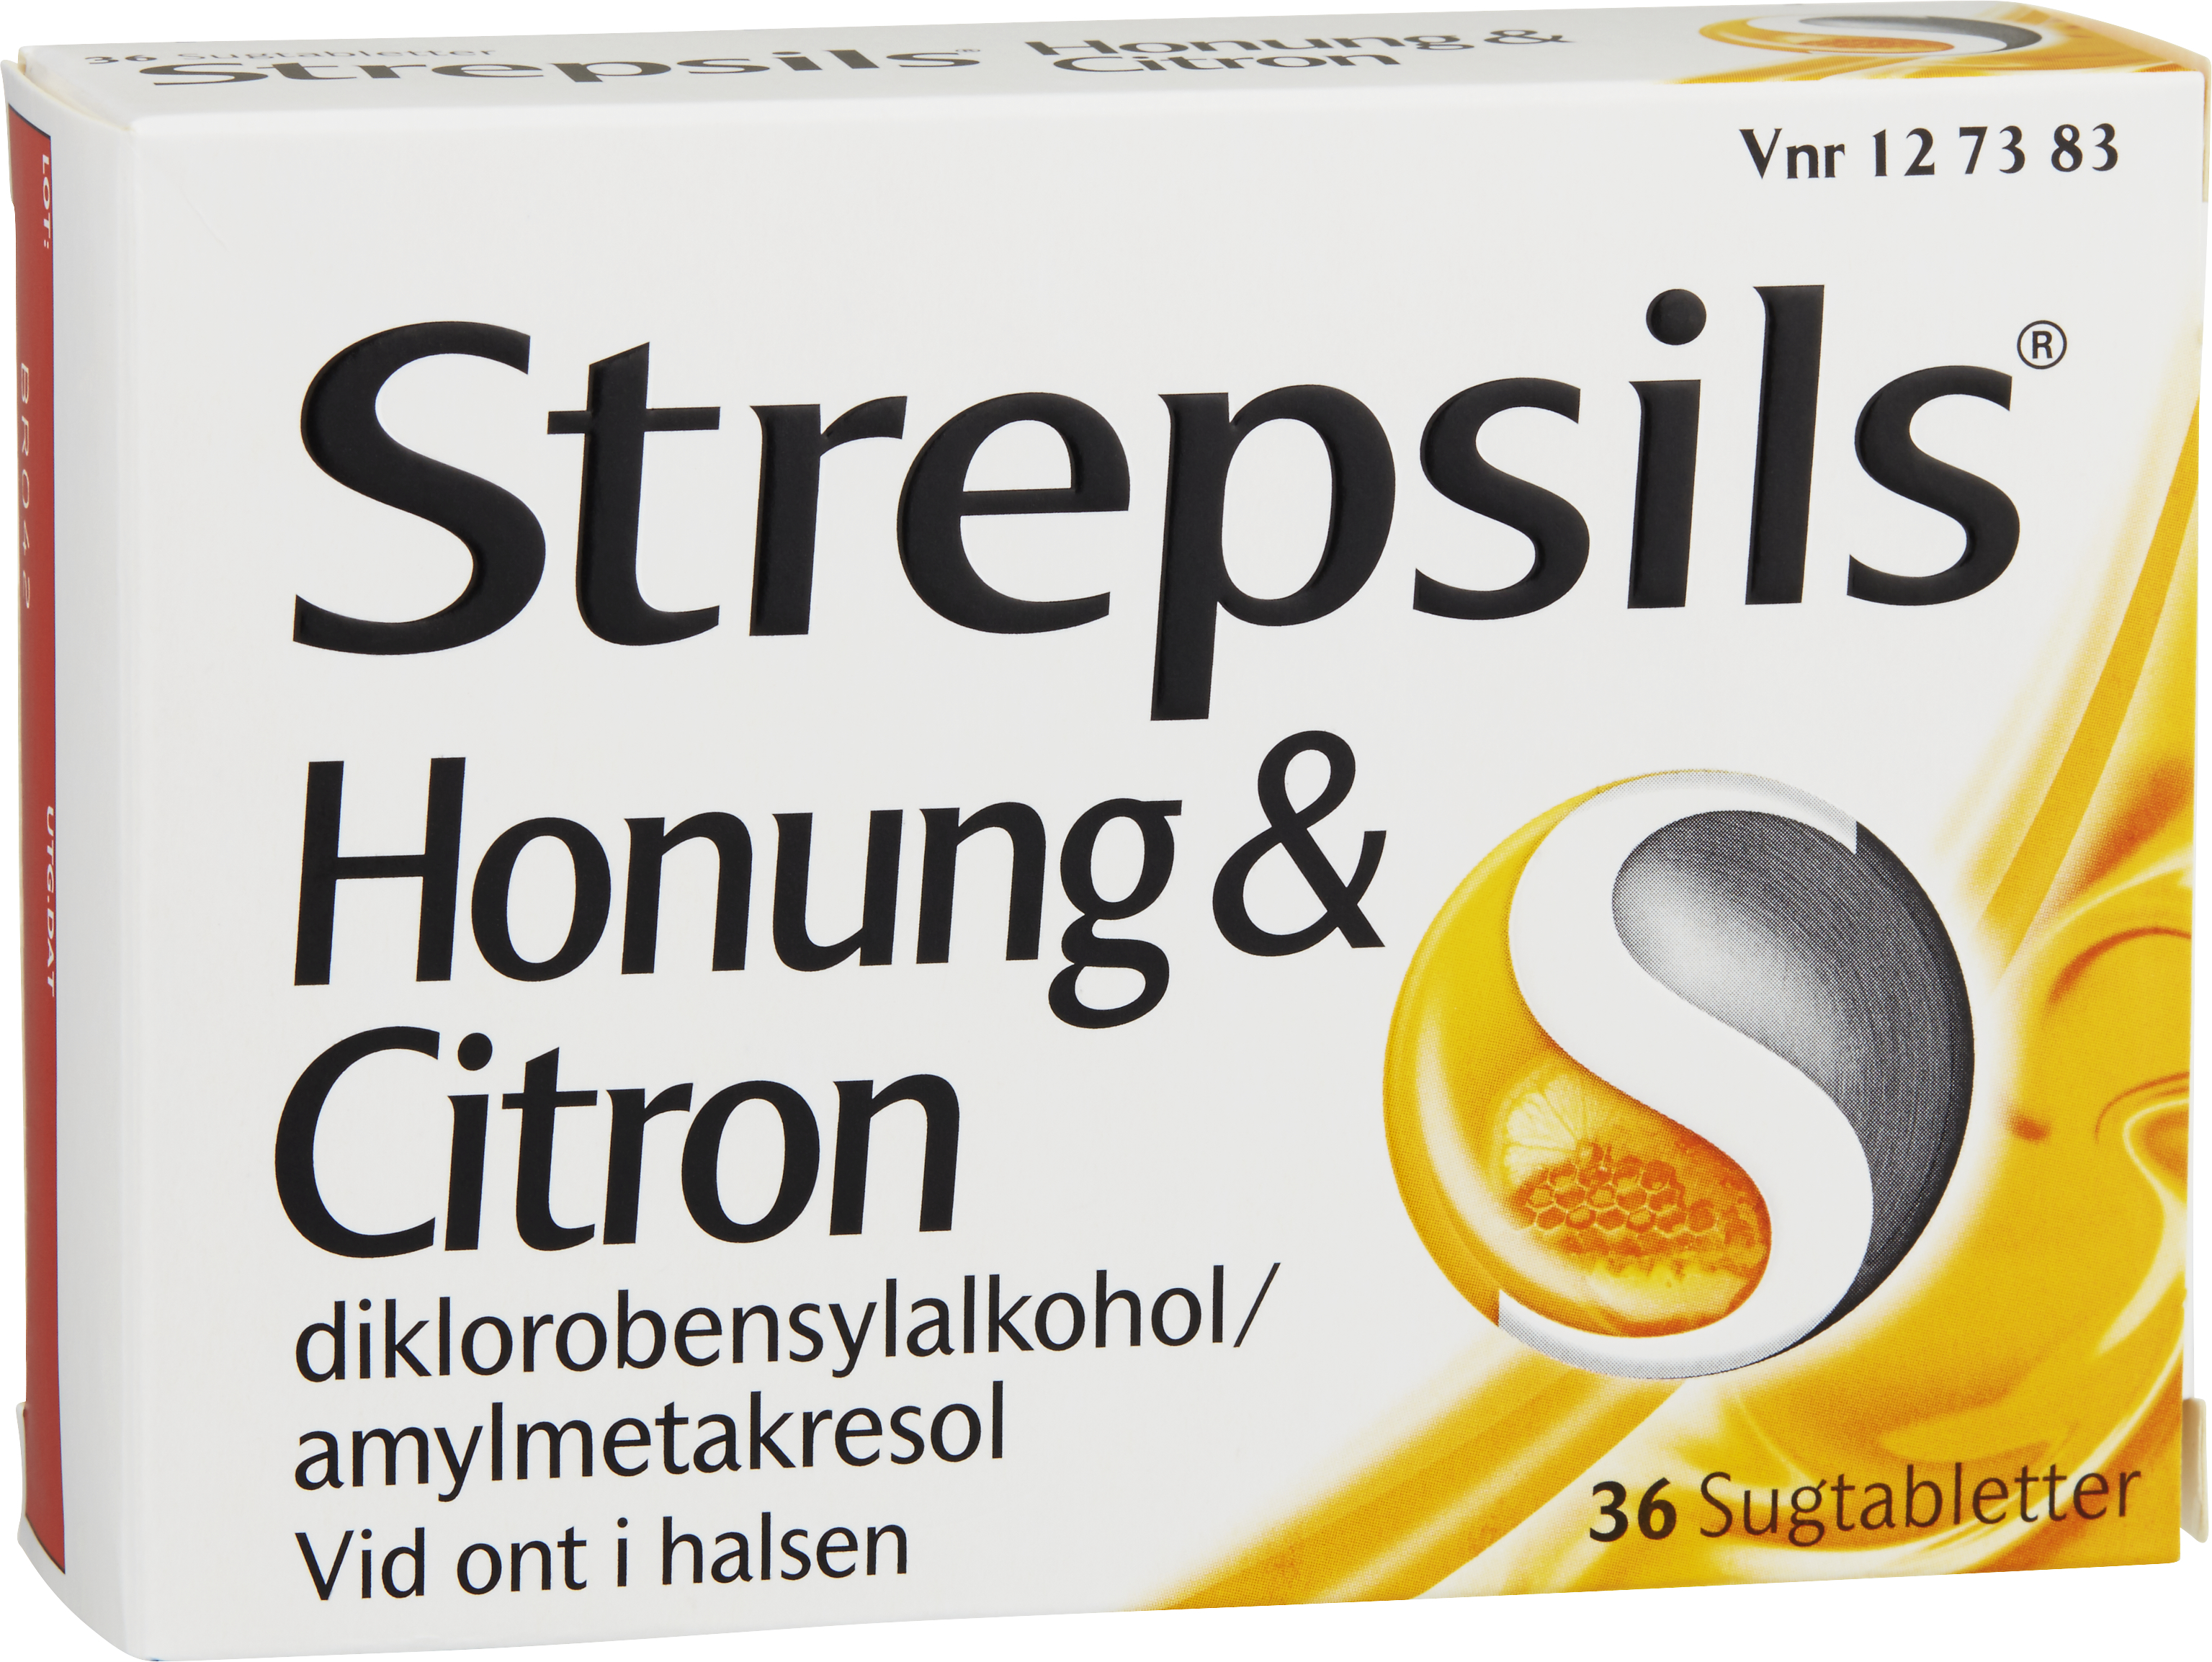 Strepsils Honung & Citron sugtablett 36 st